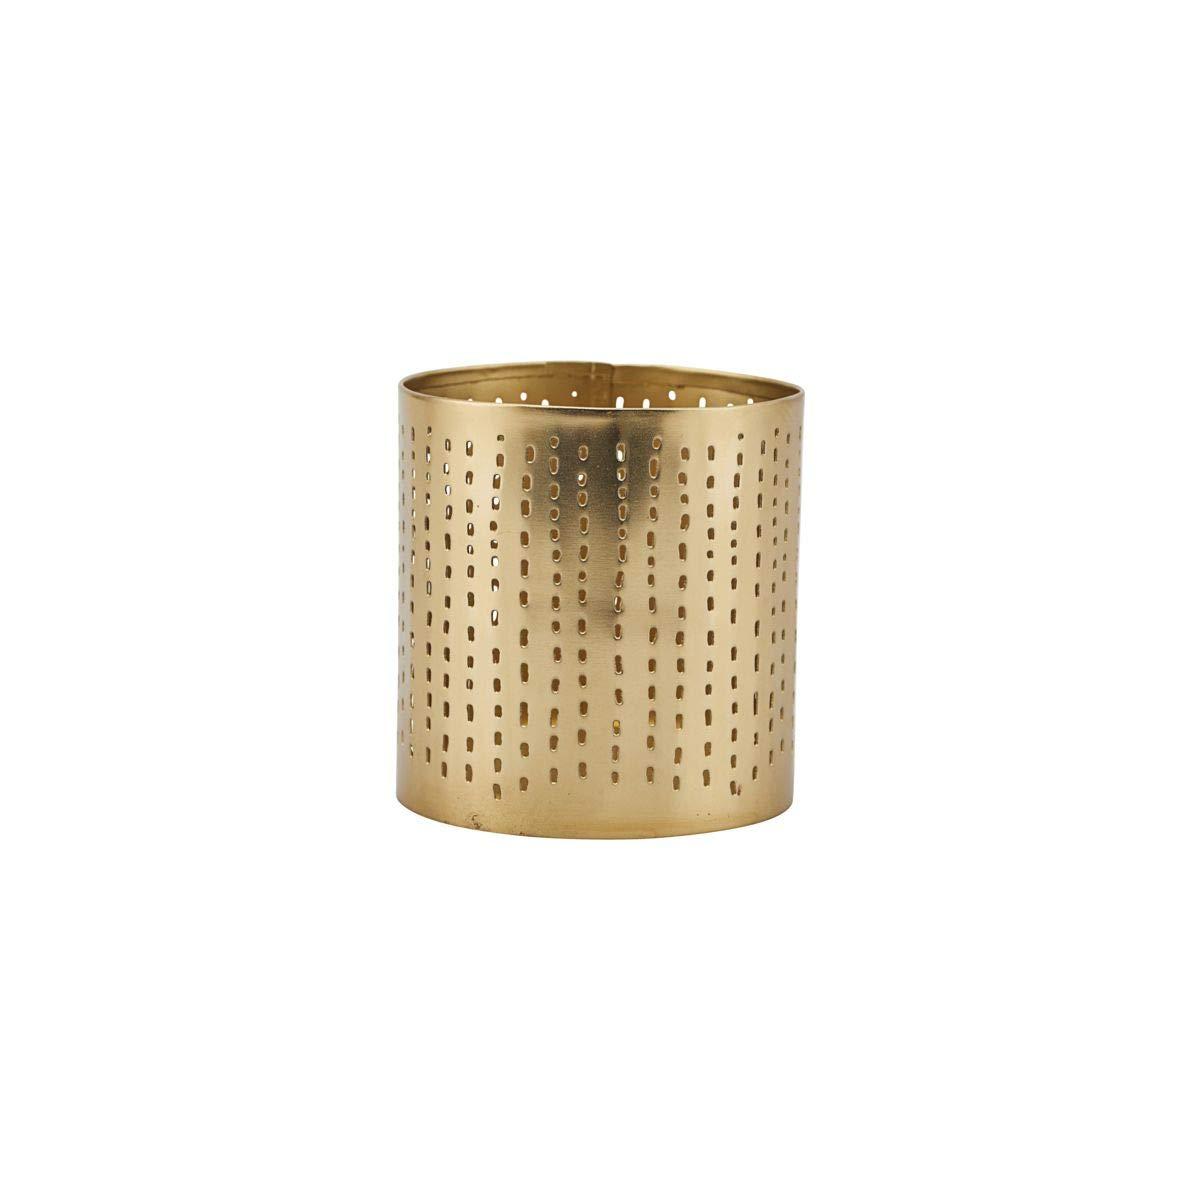 Amazon.com: House Doctor Tealight Wilma, Brass Finish, 8 x 8 ...